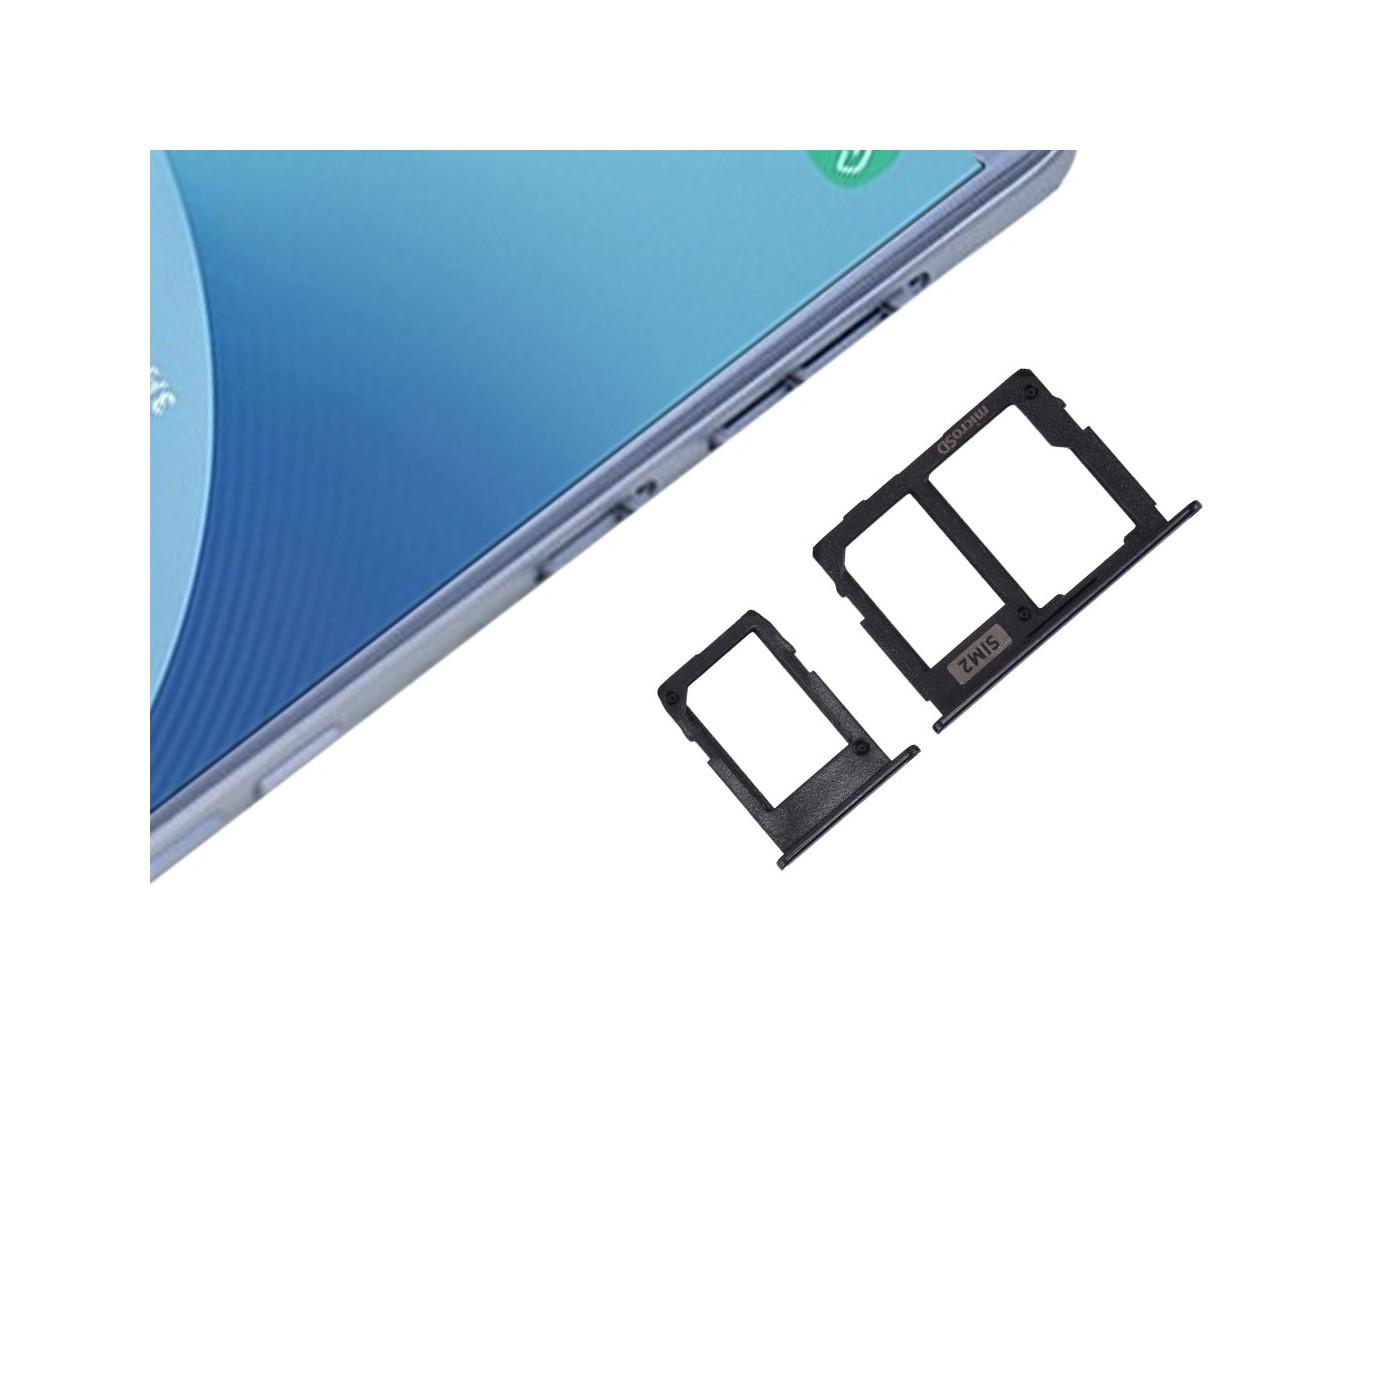 PORTA DUAL SIM + SCHEDA SD NERO SAMSUNG J3 - J5 - J7 2017 SLOT SLITTA